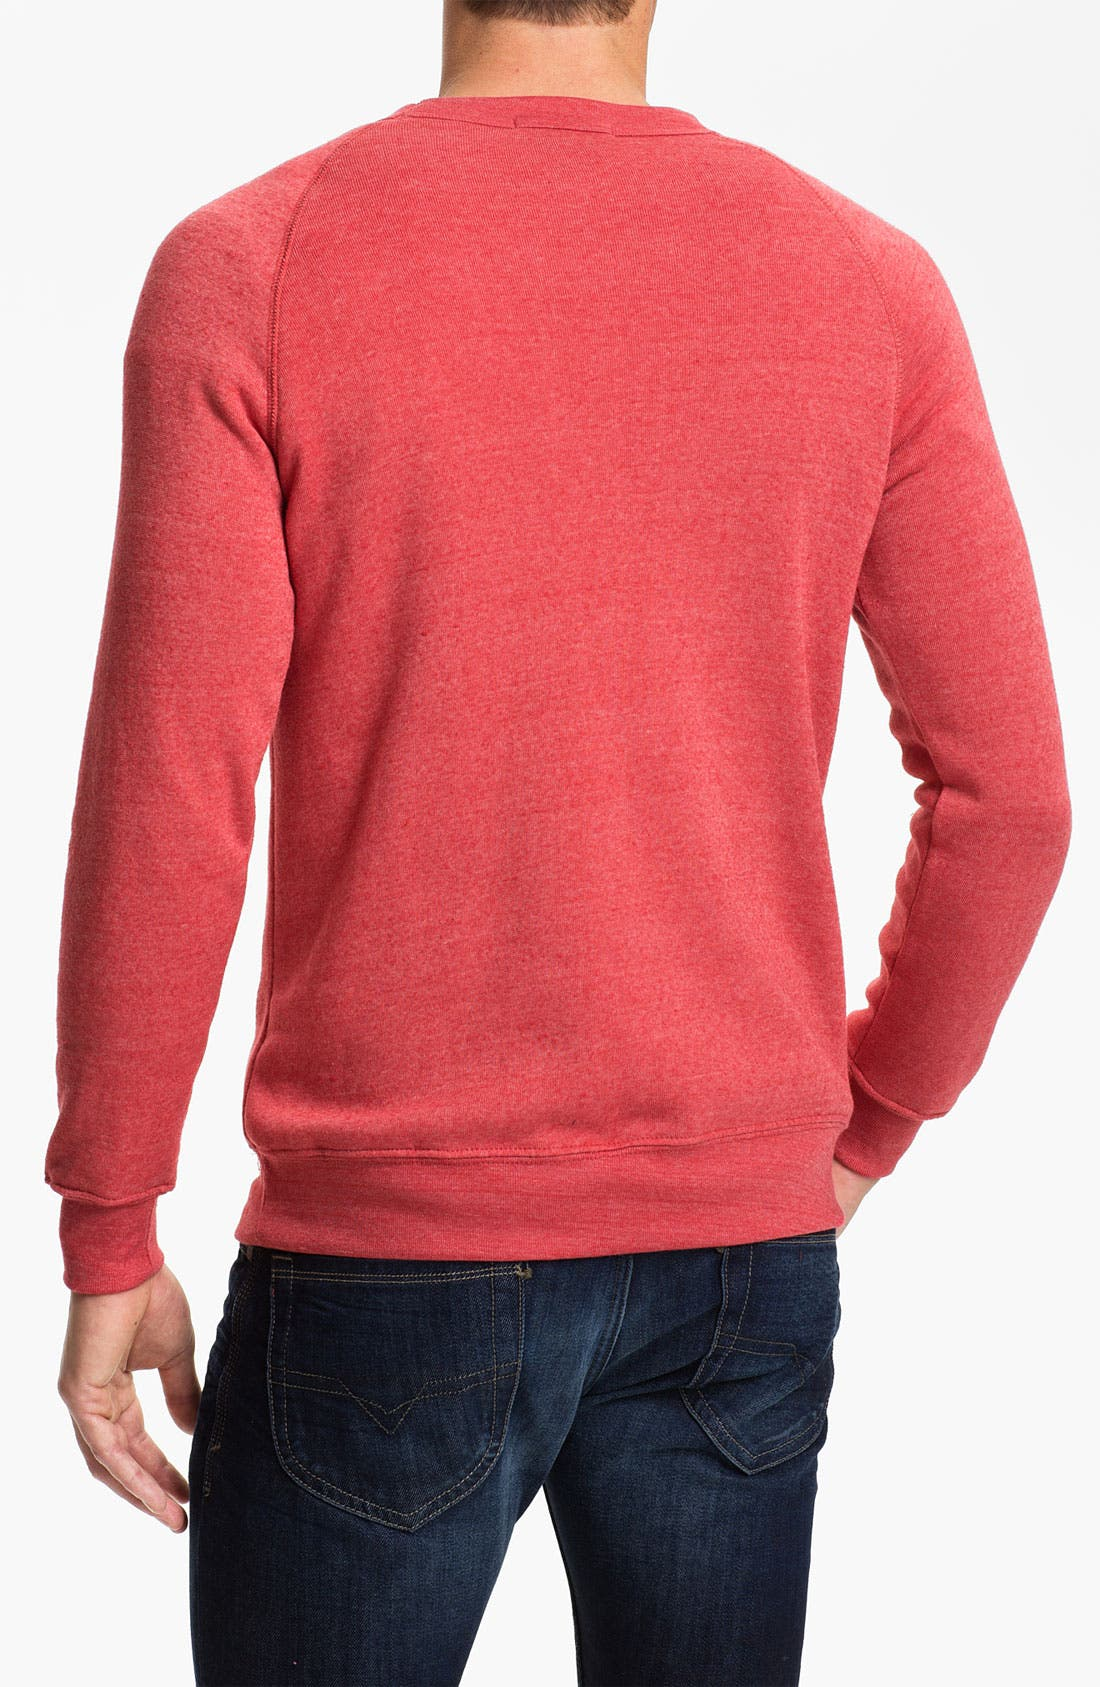 'The Champ' Sweatshirt,                             Alternate thumbnail 27, color,